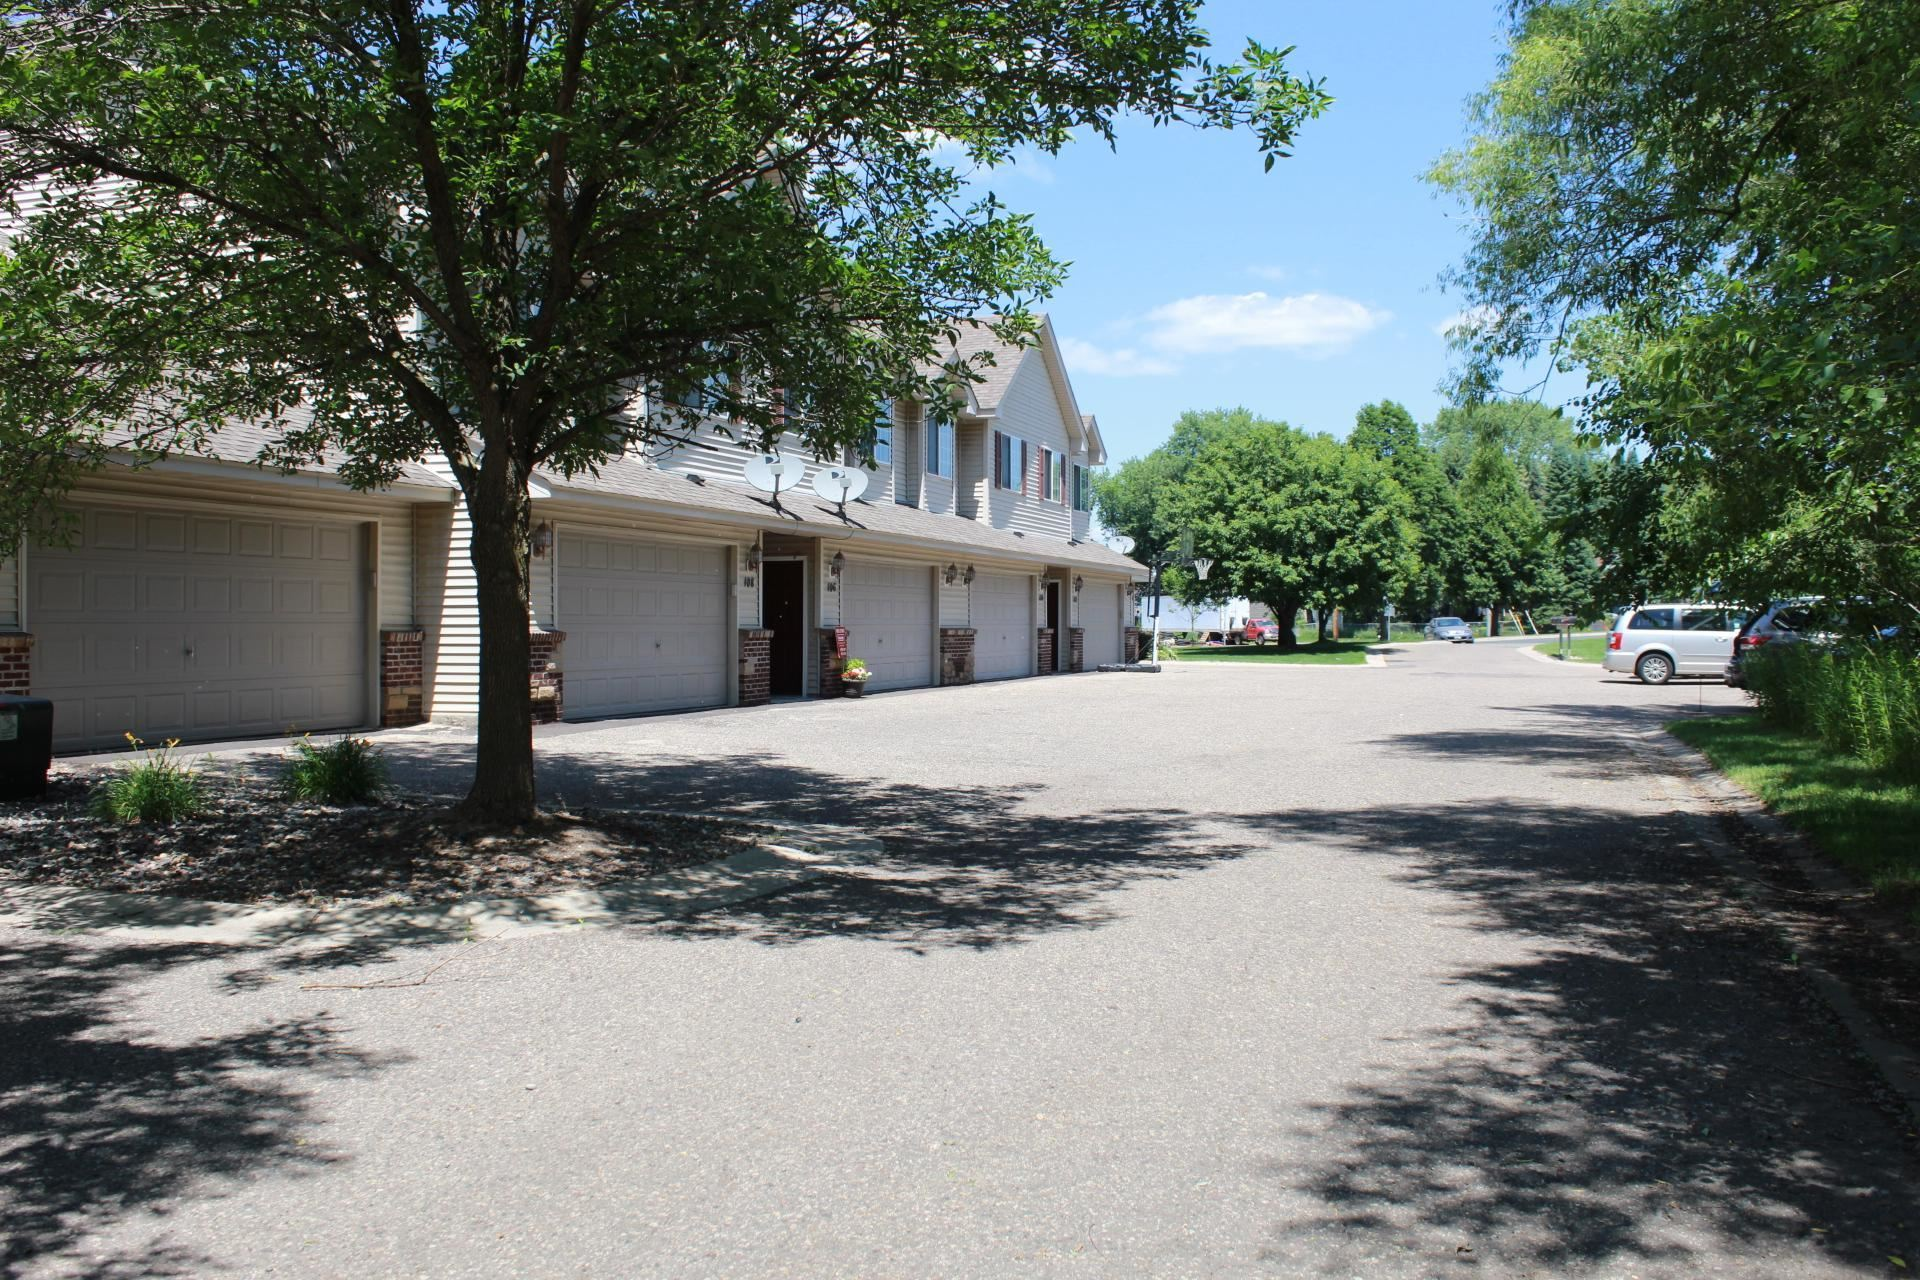 106 Firebarn Road, Circle Pines, MN 55014 - MLS#: 5614232